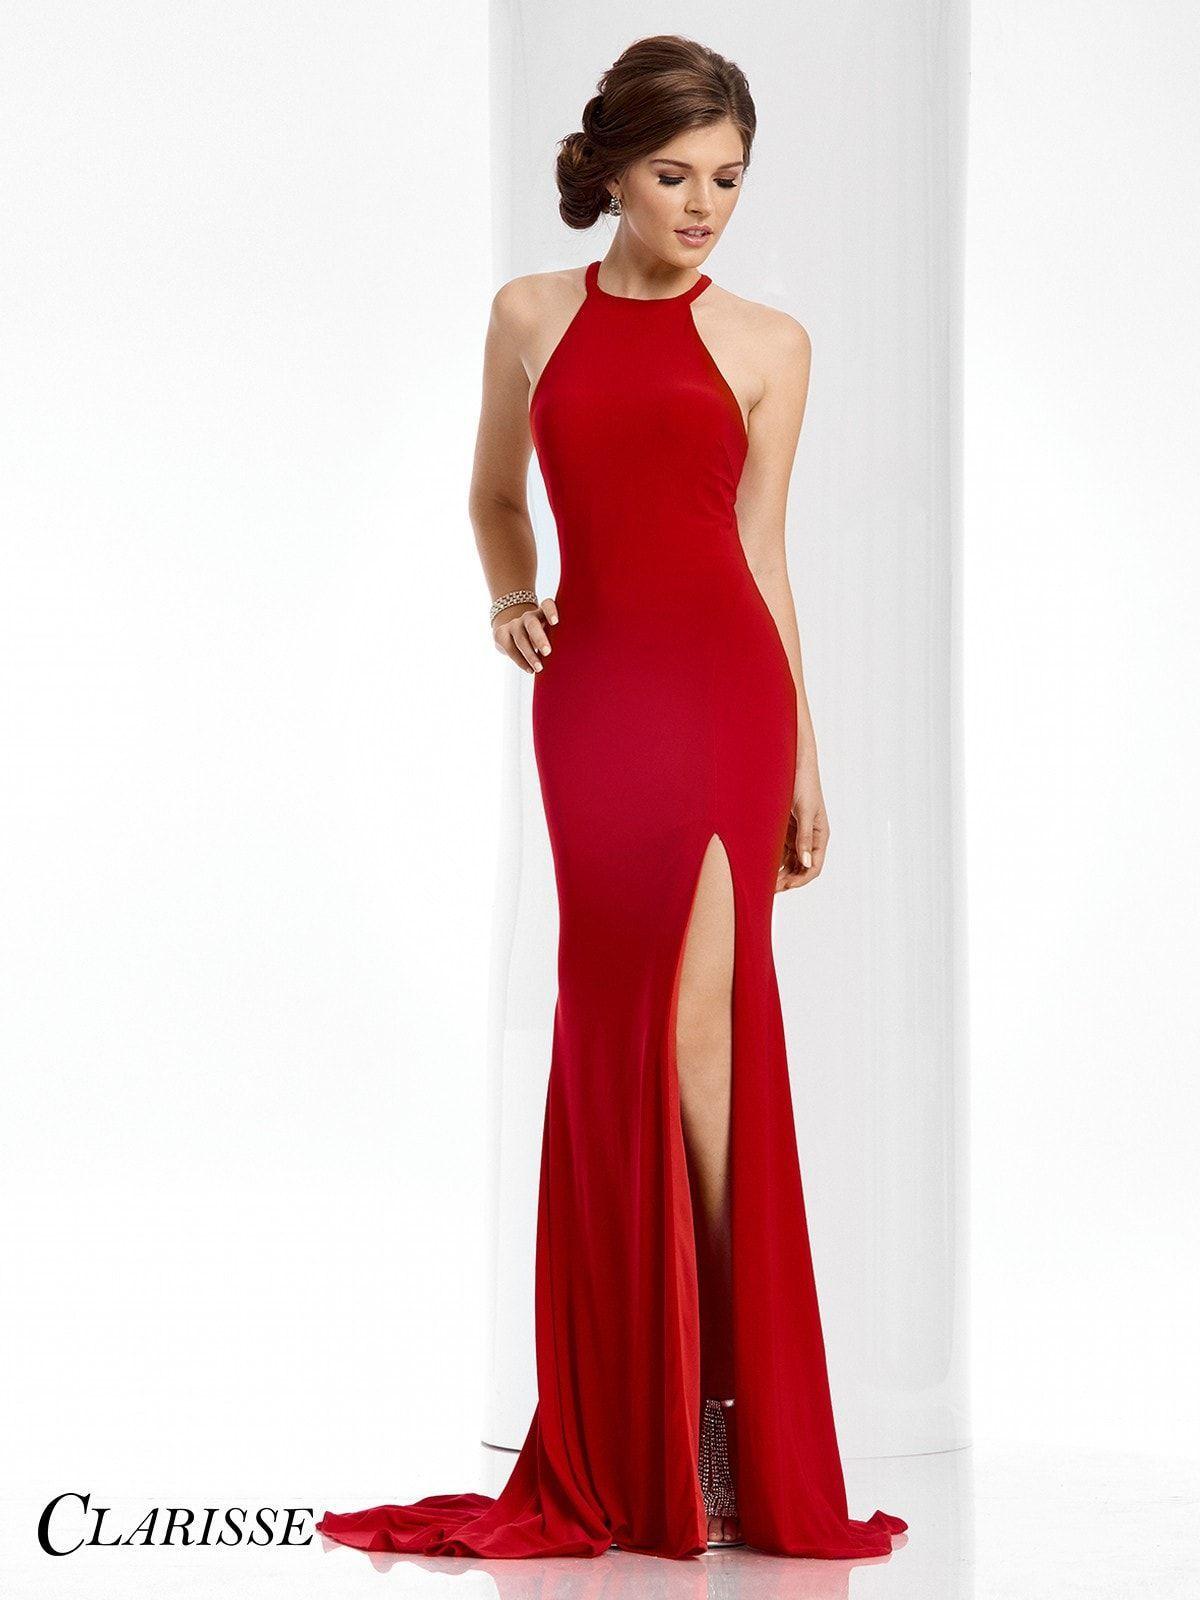 Clarisse prom apple red high neckline prom dress fashion